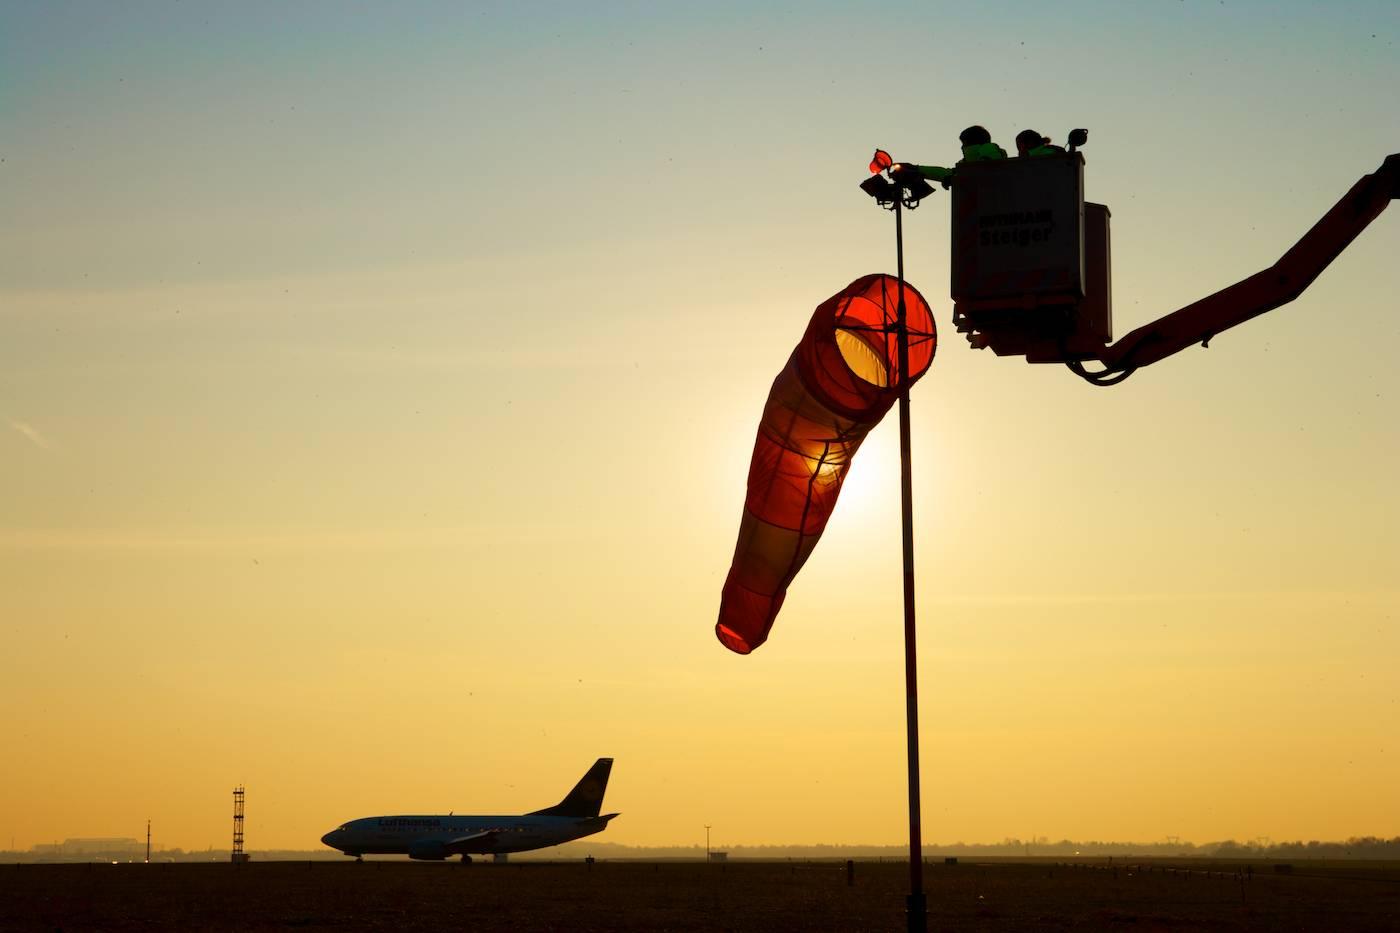 Flughafen Düsseldorf | Elektroniker